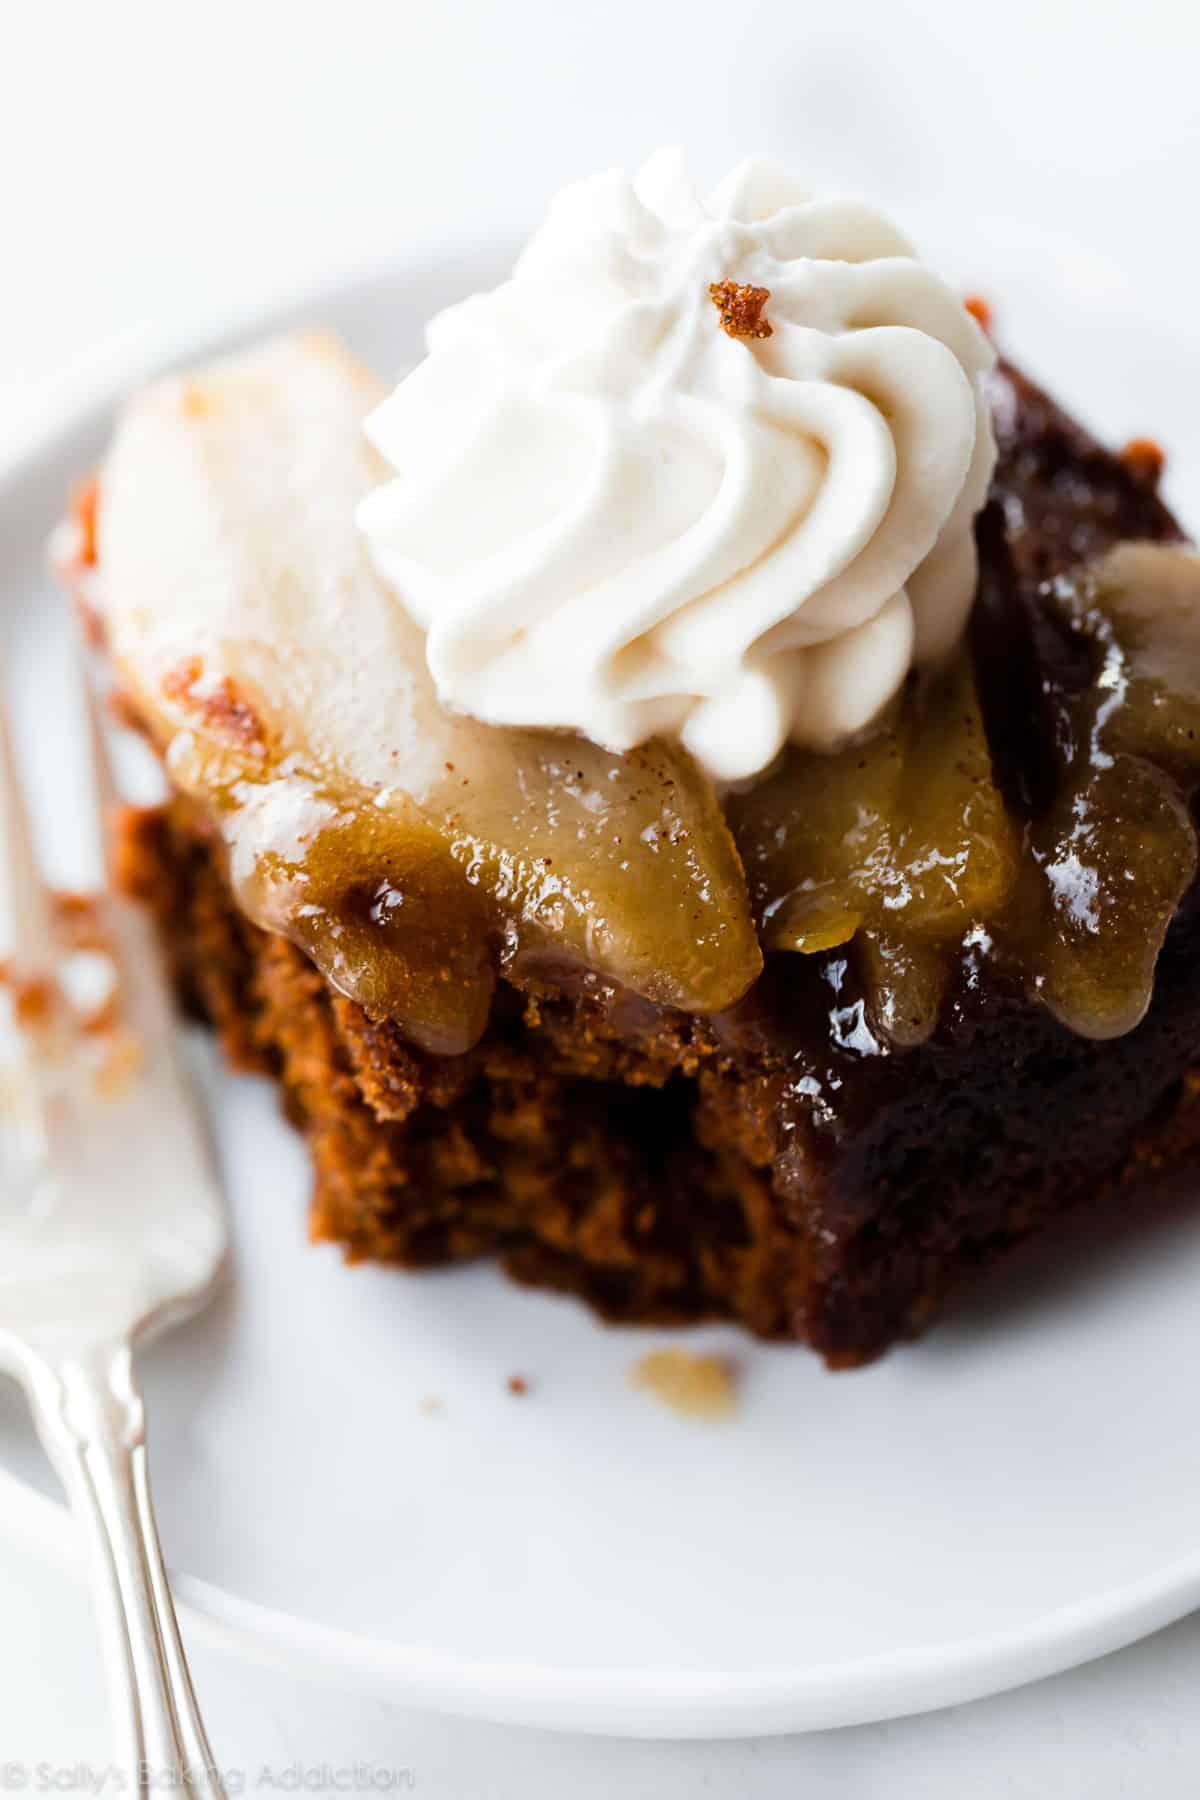 Upside down pear gingerbread recipe